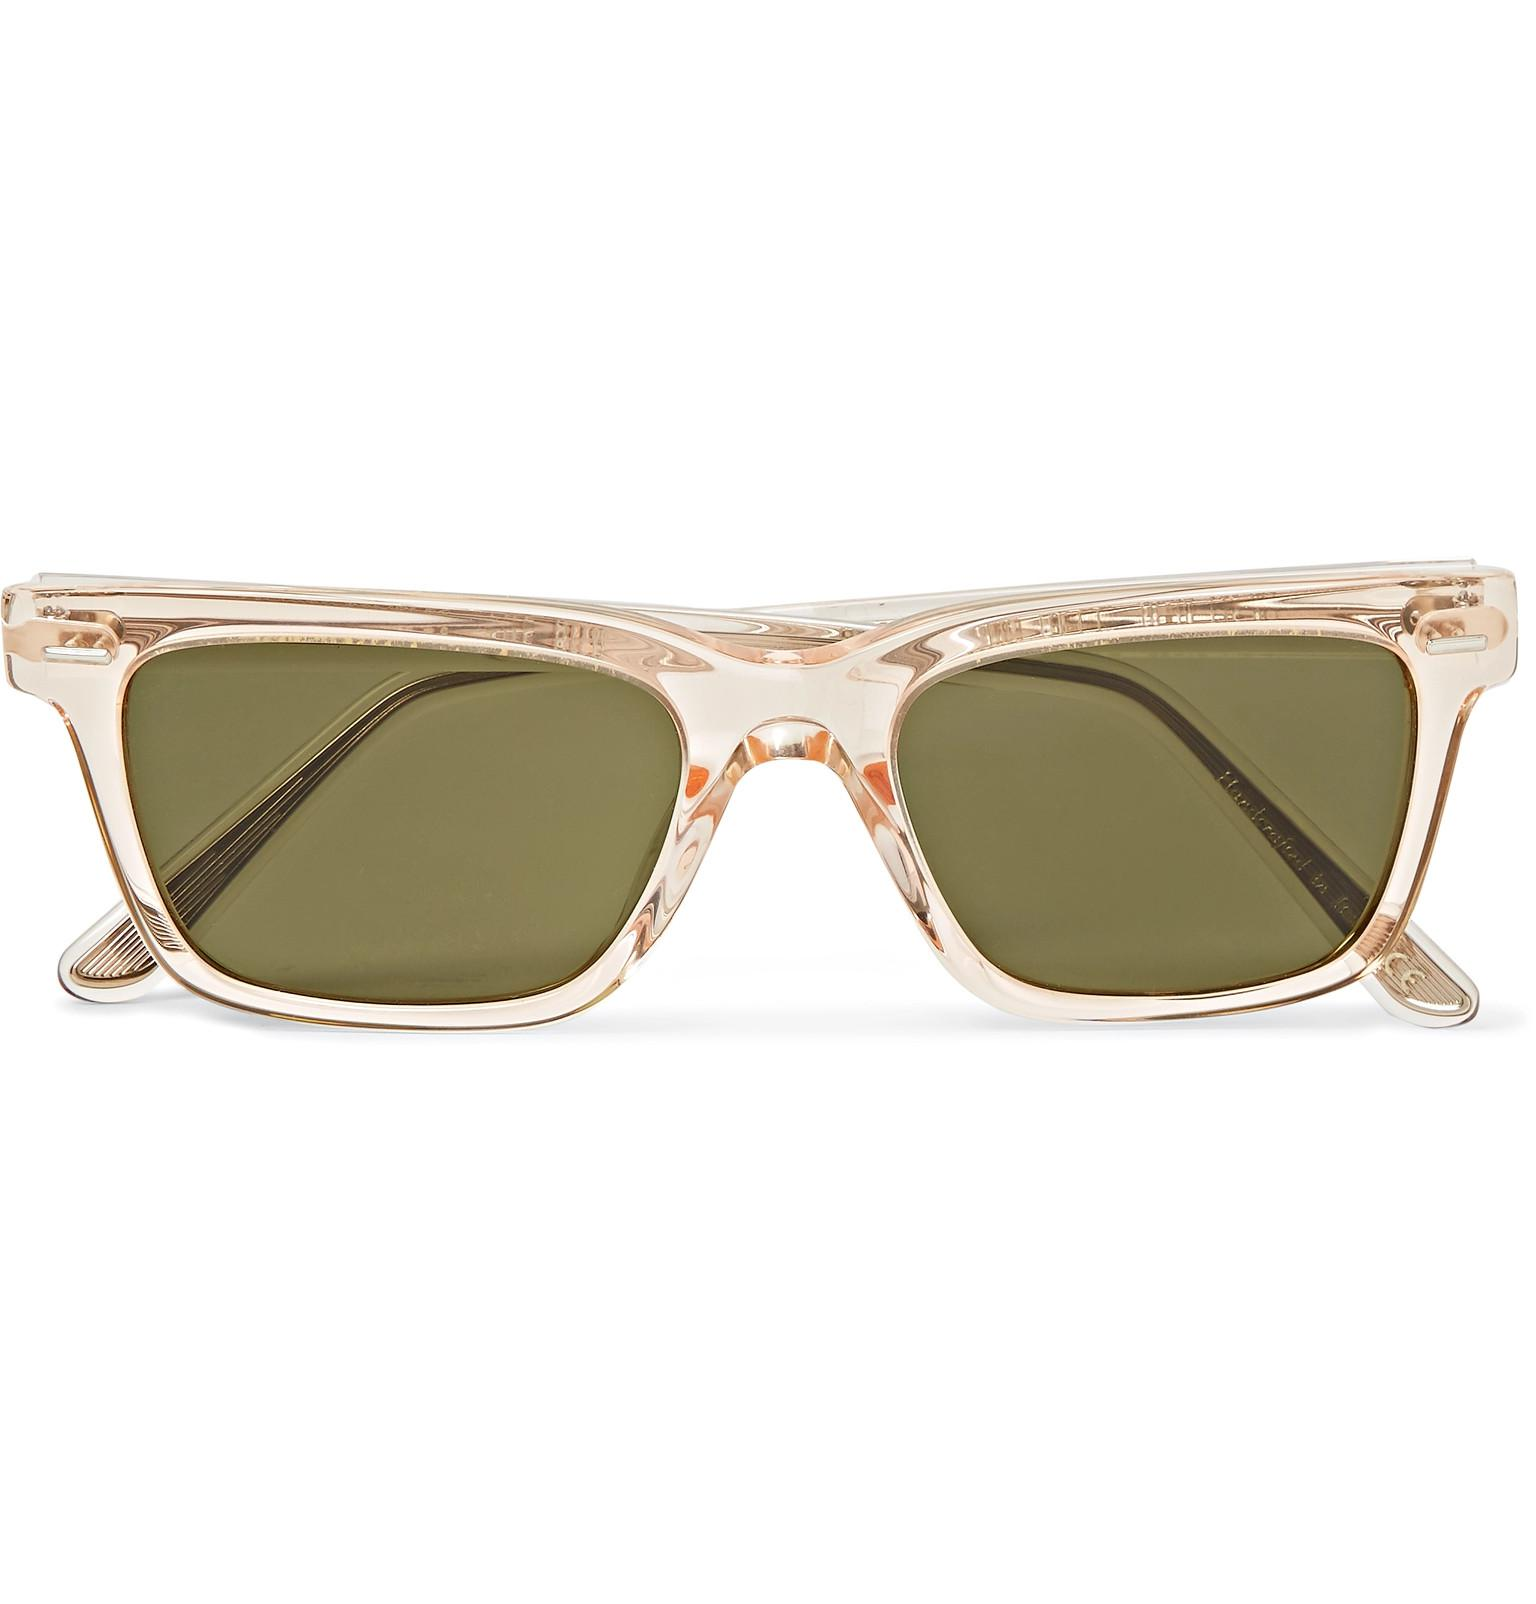 33698e8d5ef17 The Row Oliver Peoples Ba Cc Square-frame Acetate Sunglasses for Men ...